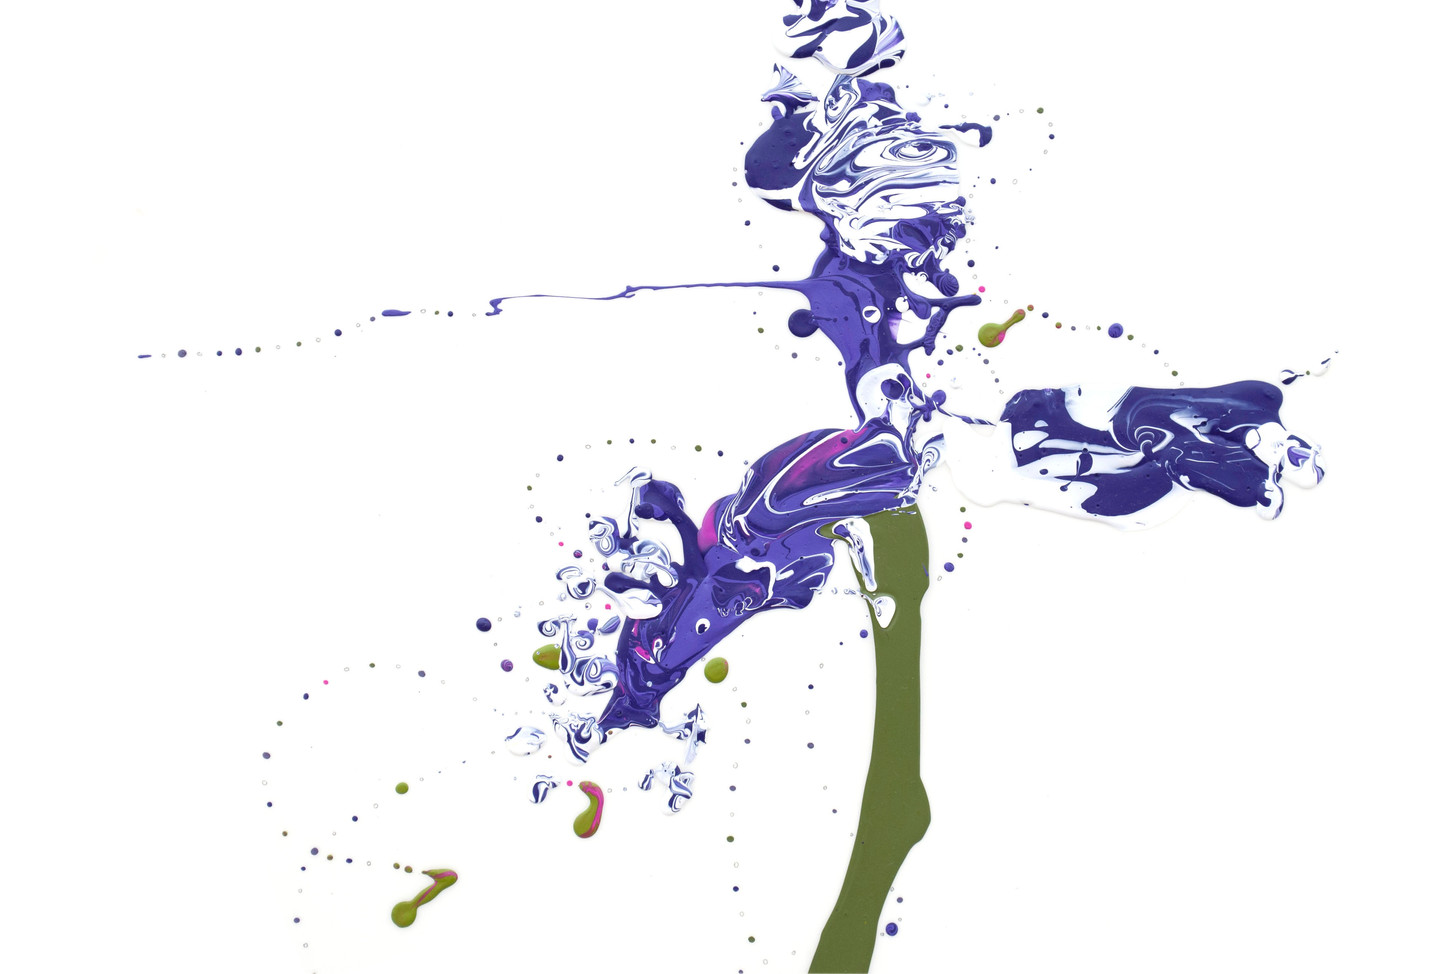 Detail Image of Flora XXIII